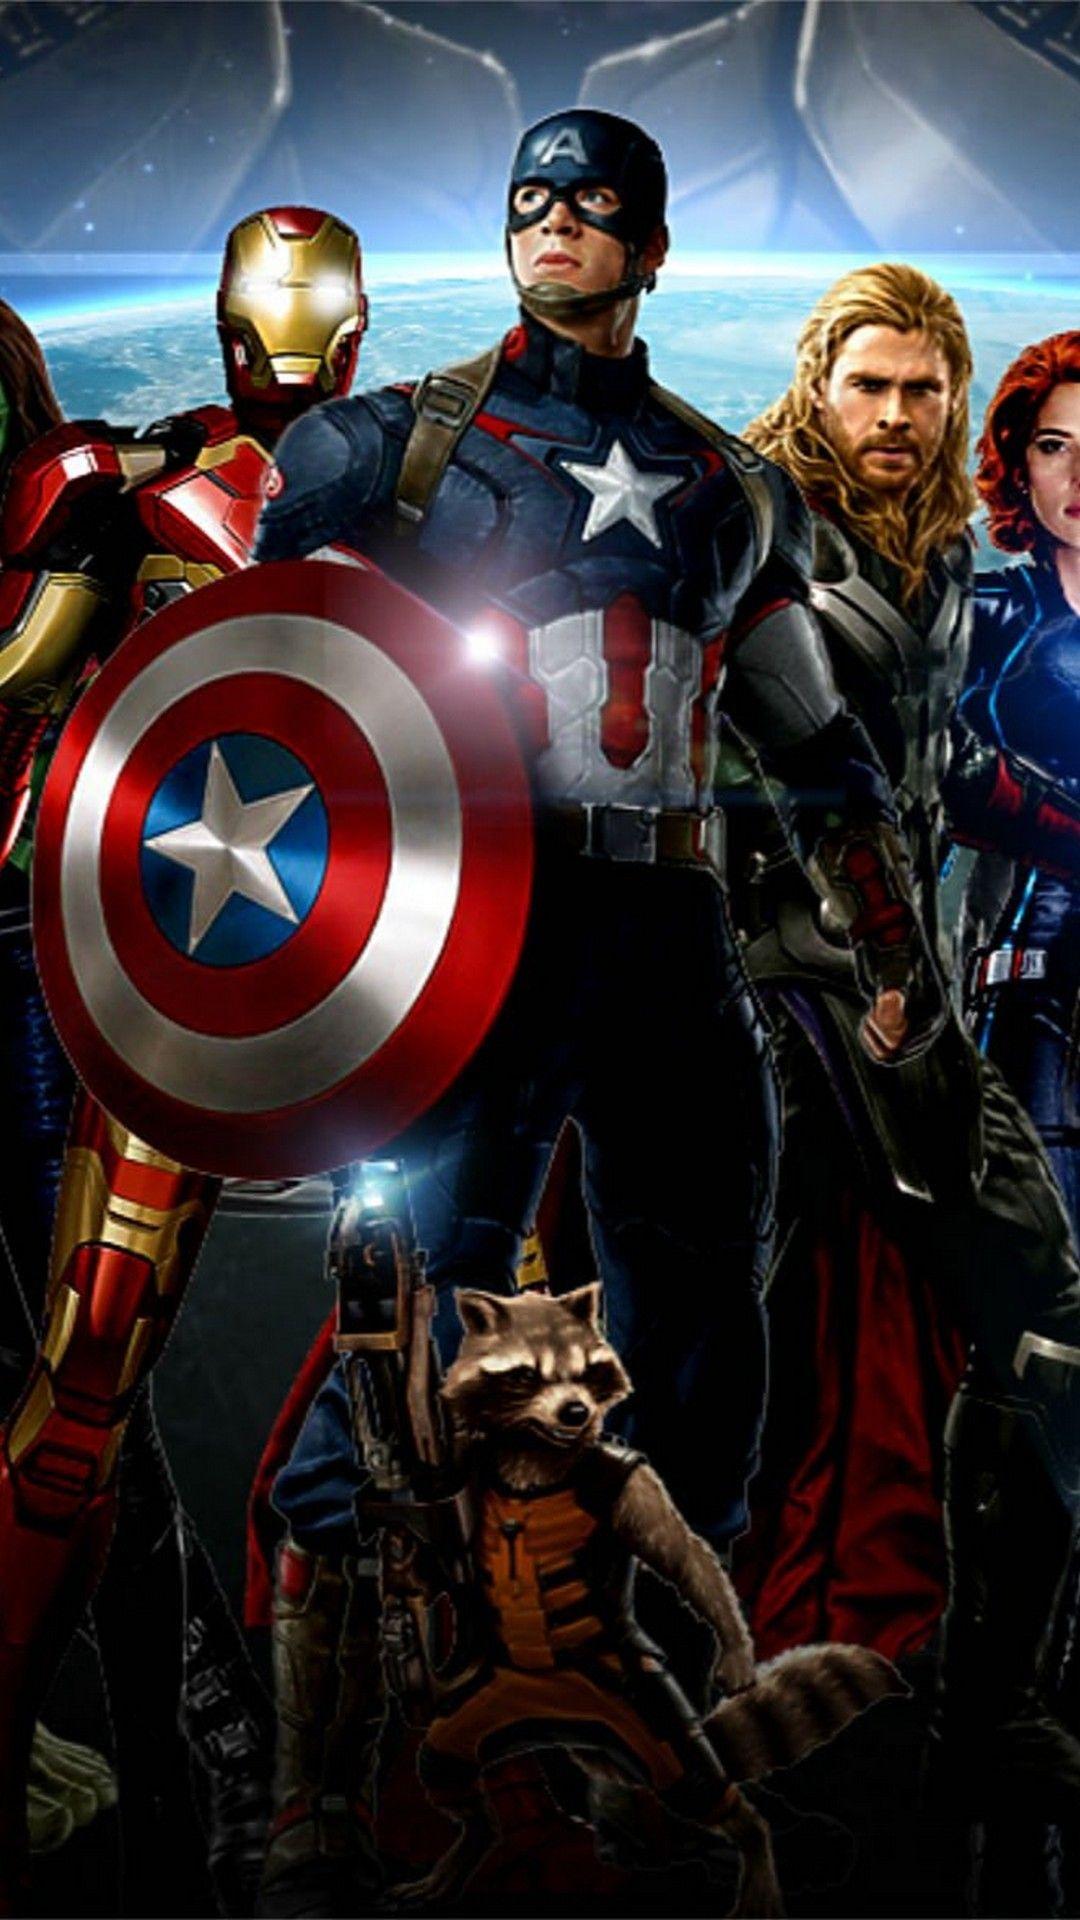 Wallpaper Iphone Avengers Infinity War